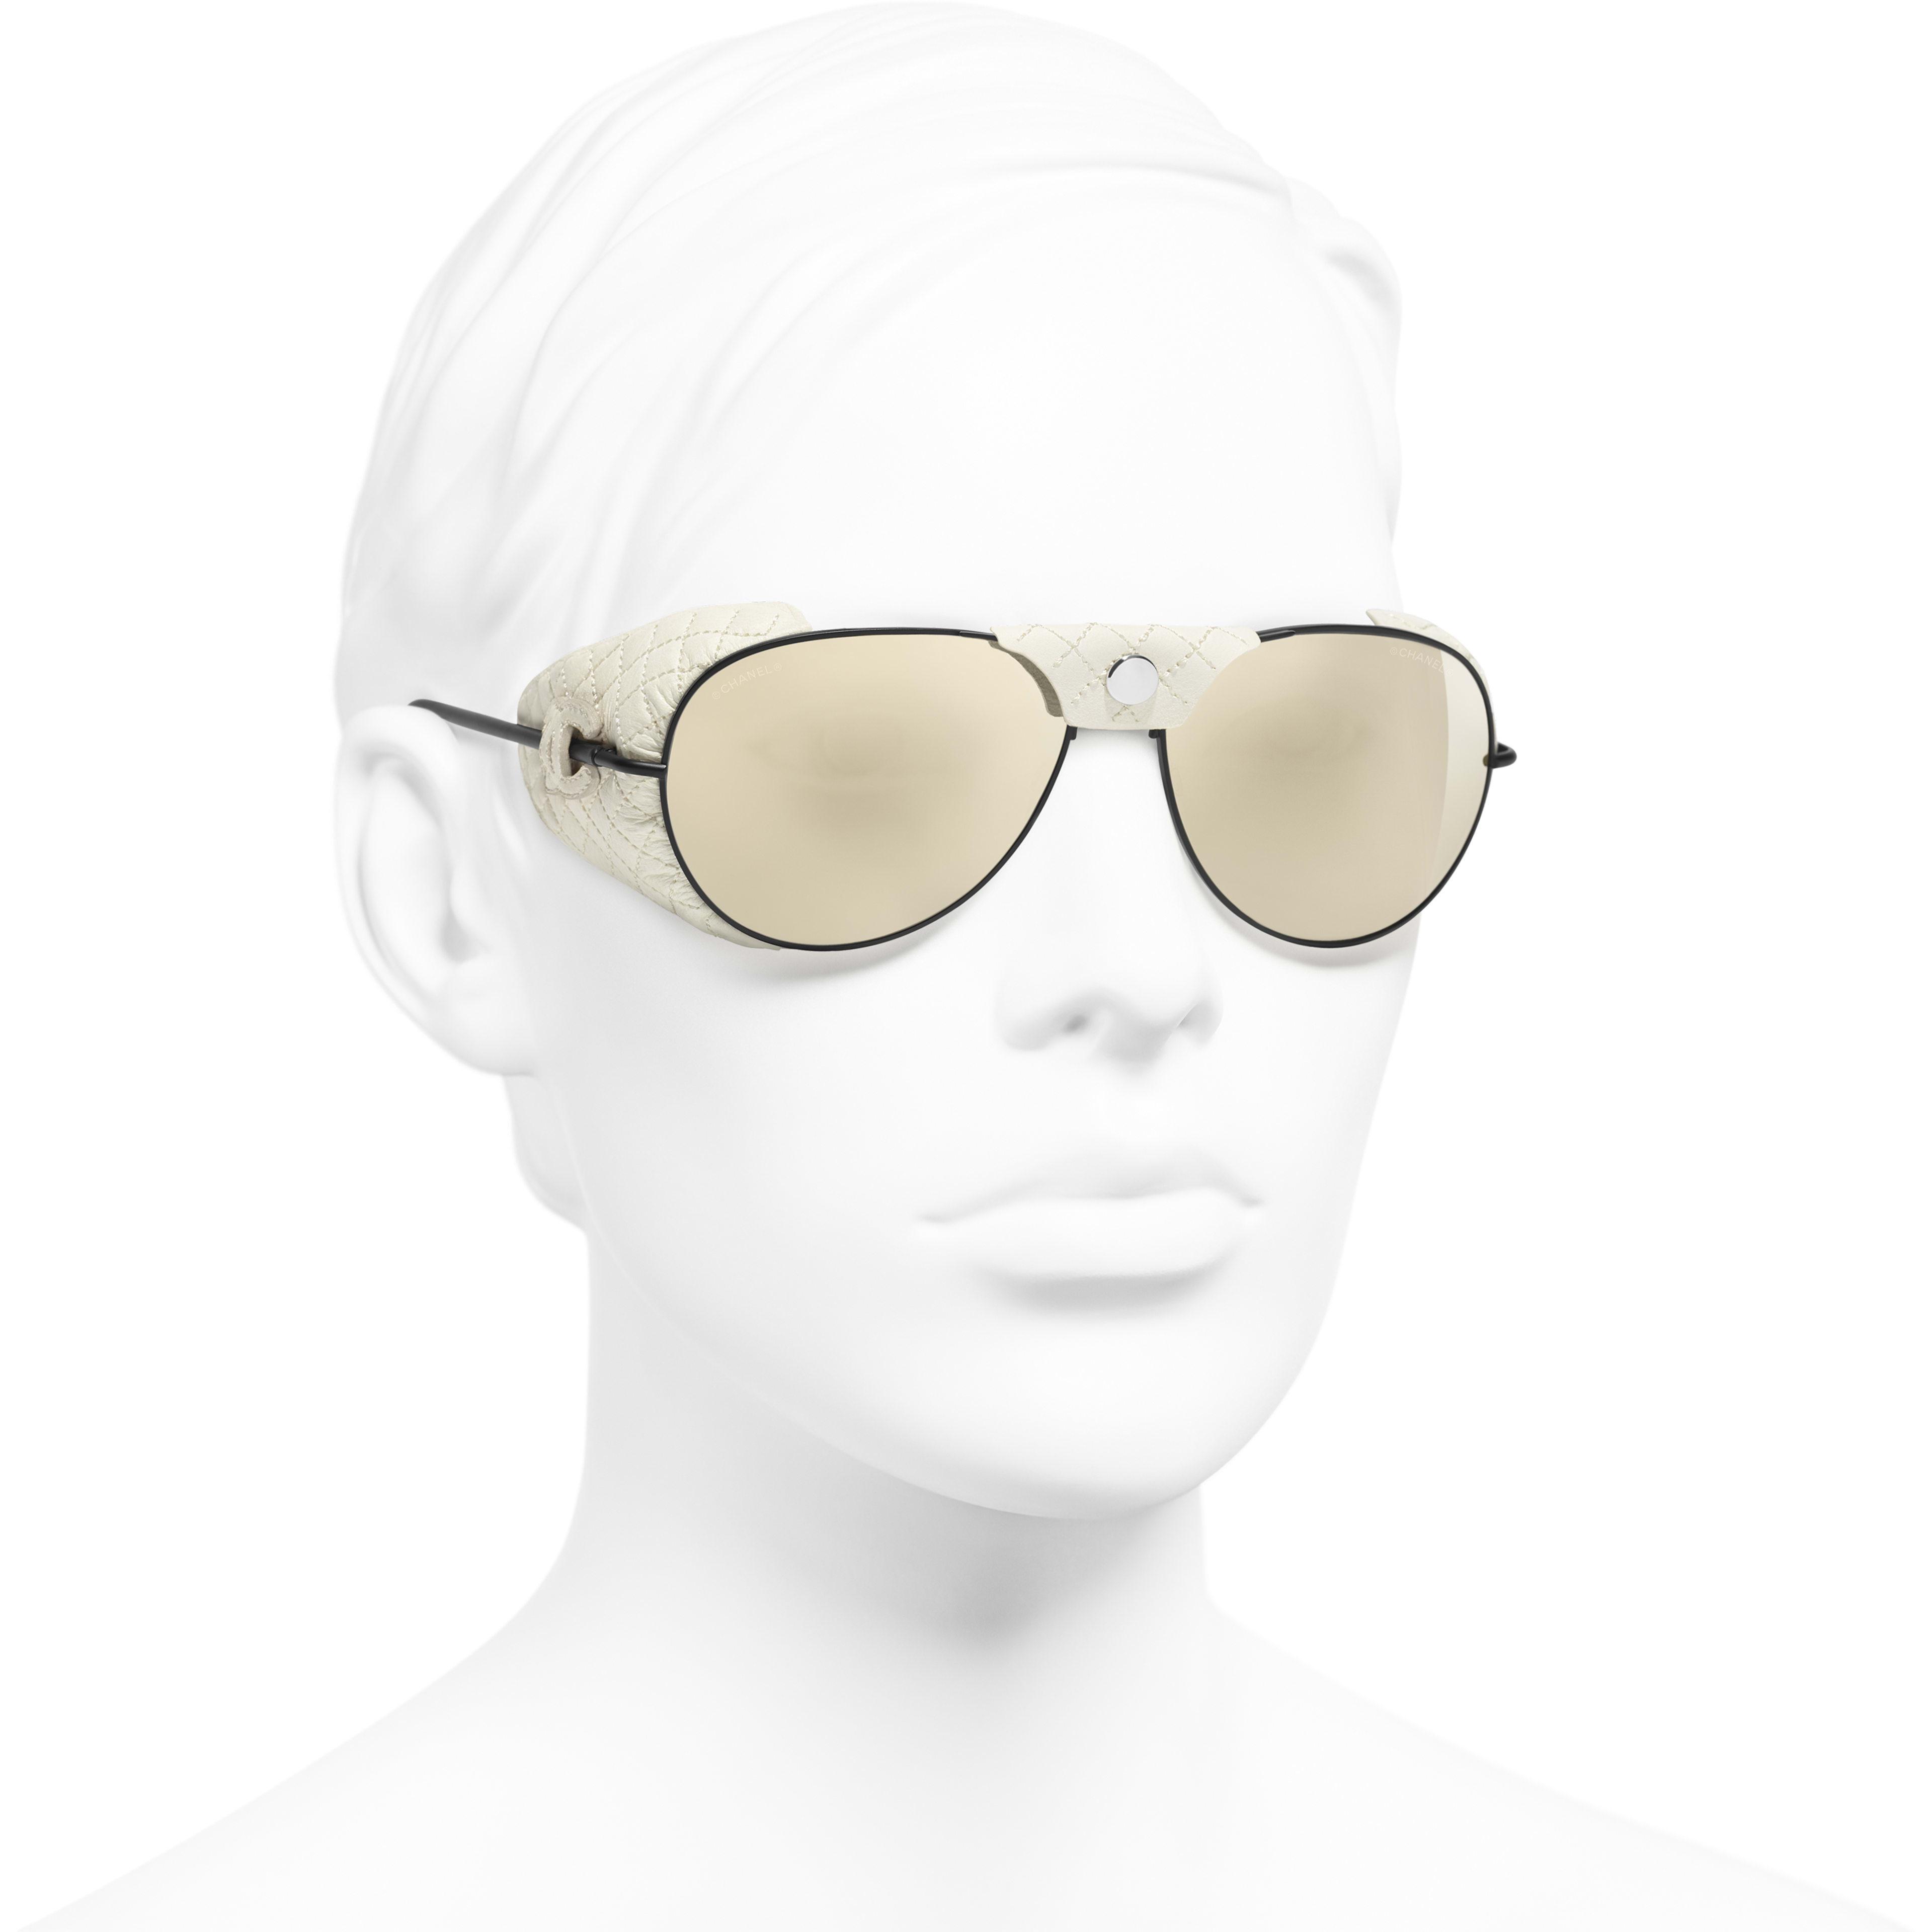 3355ea5ee1 ... Pilot Sunglasses - White - Metal